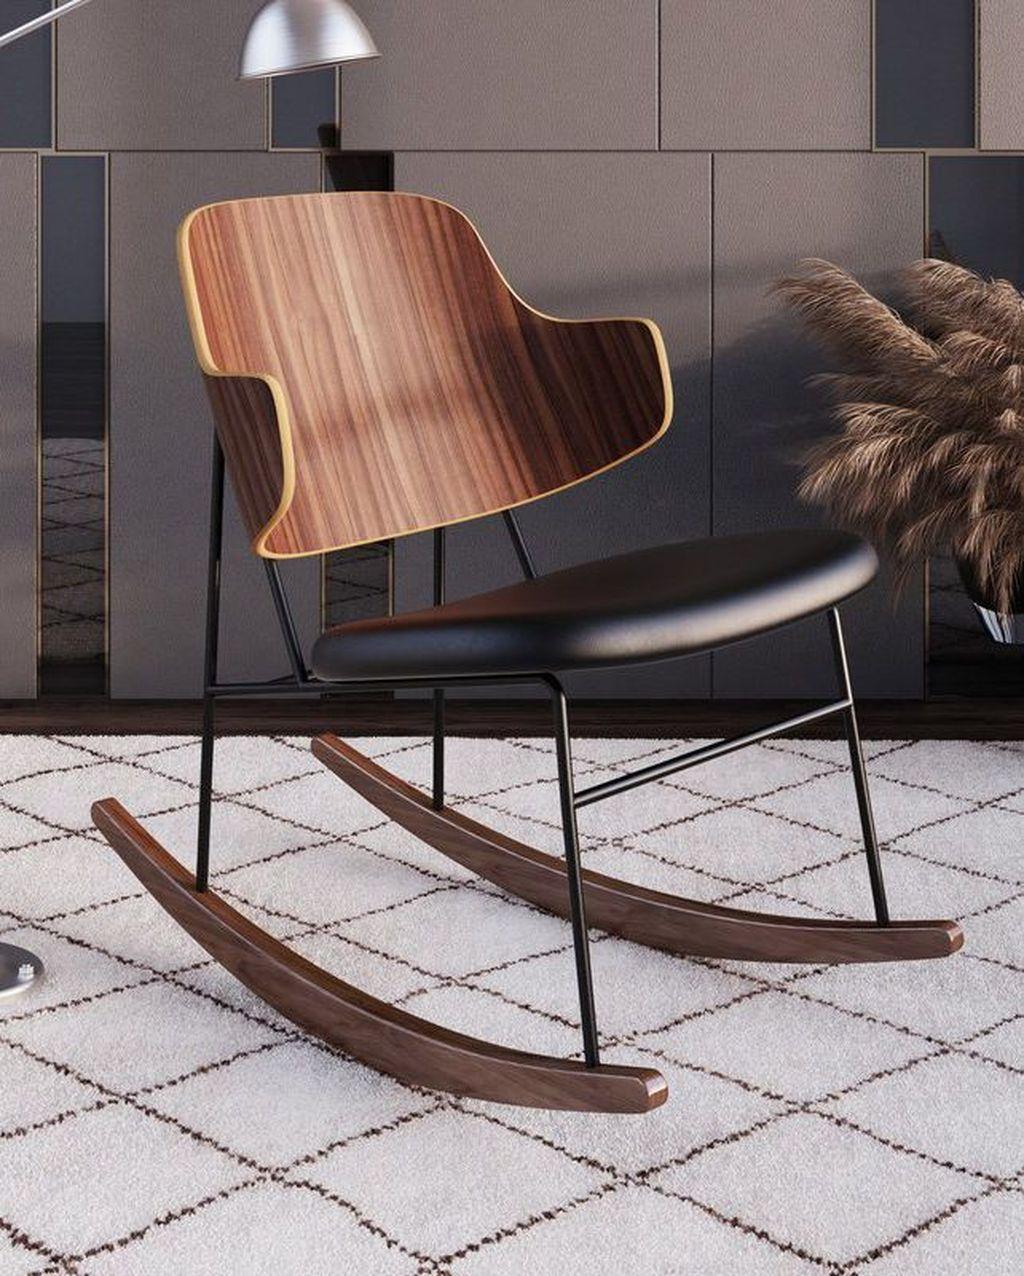 Amazing Rocking Chair Design Ideas 33